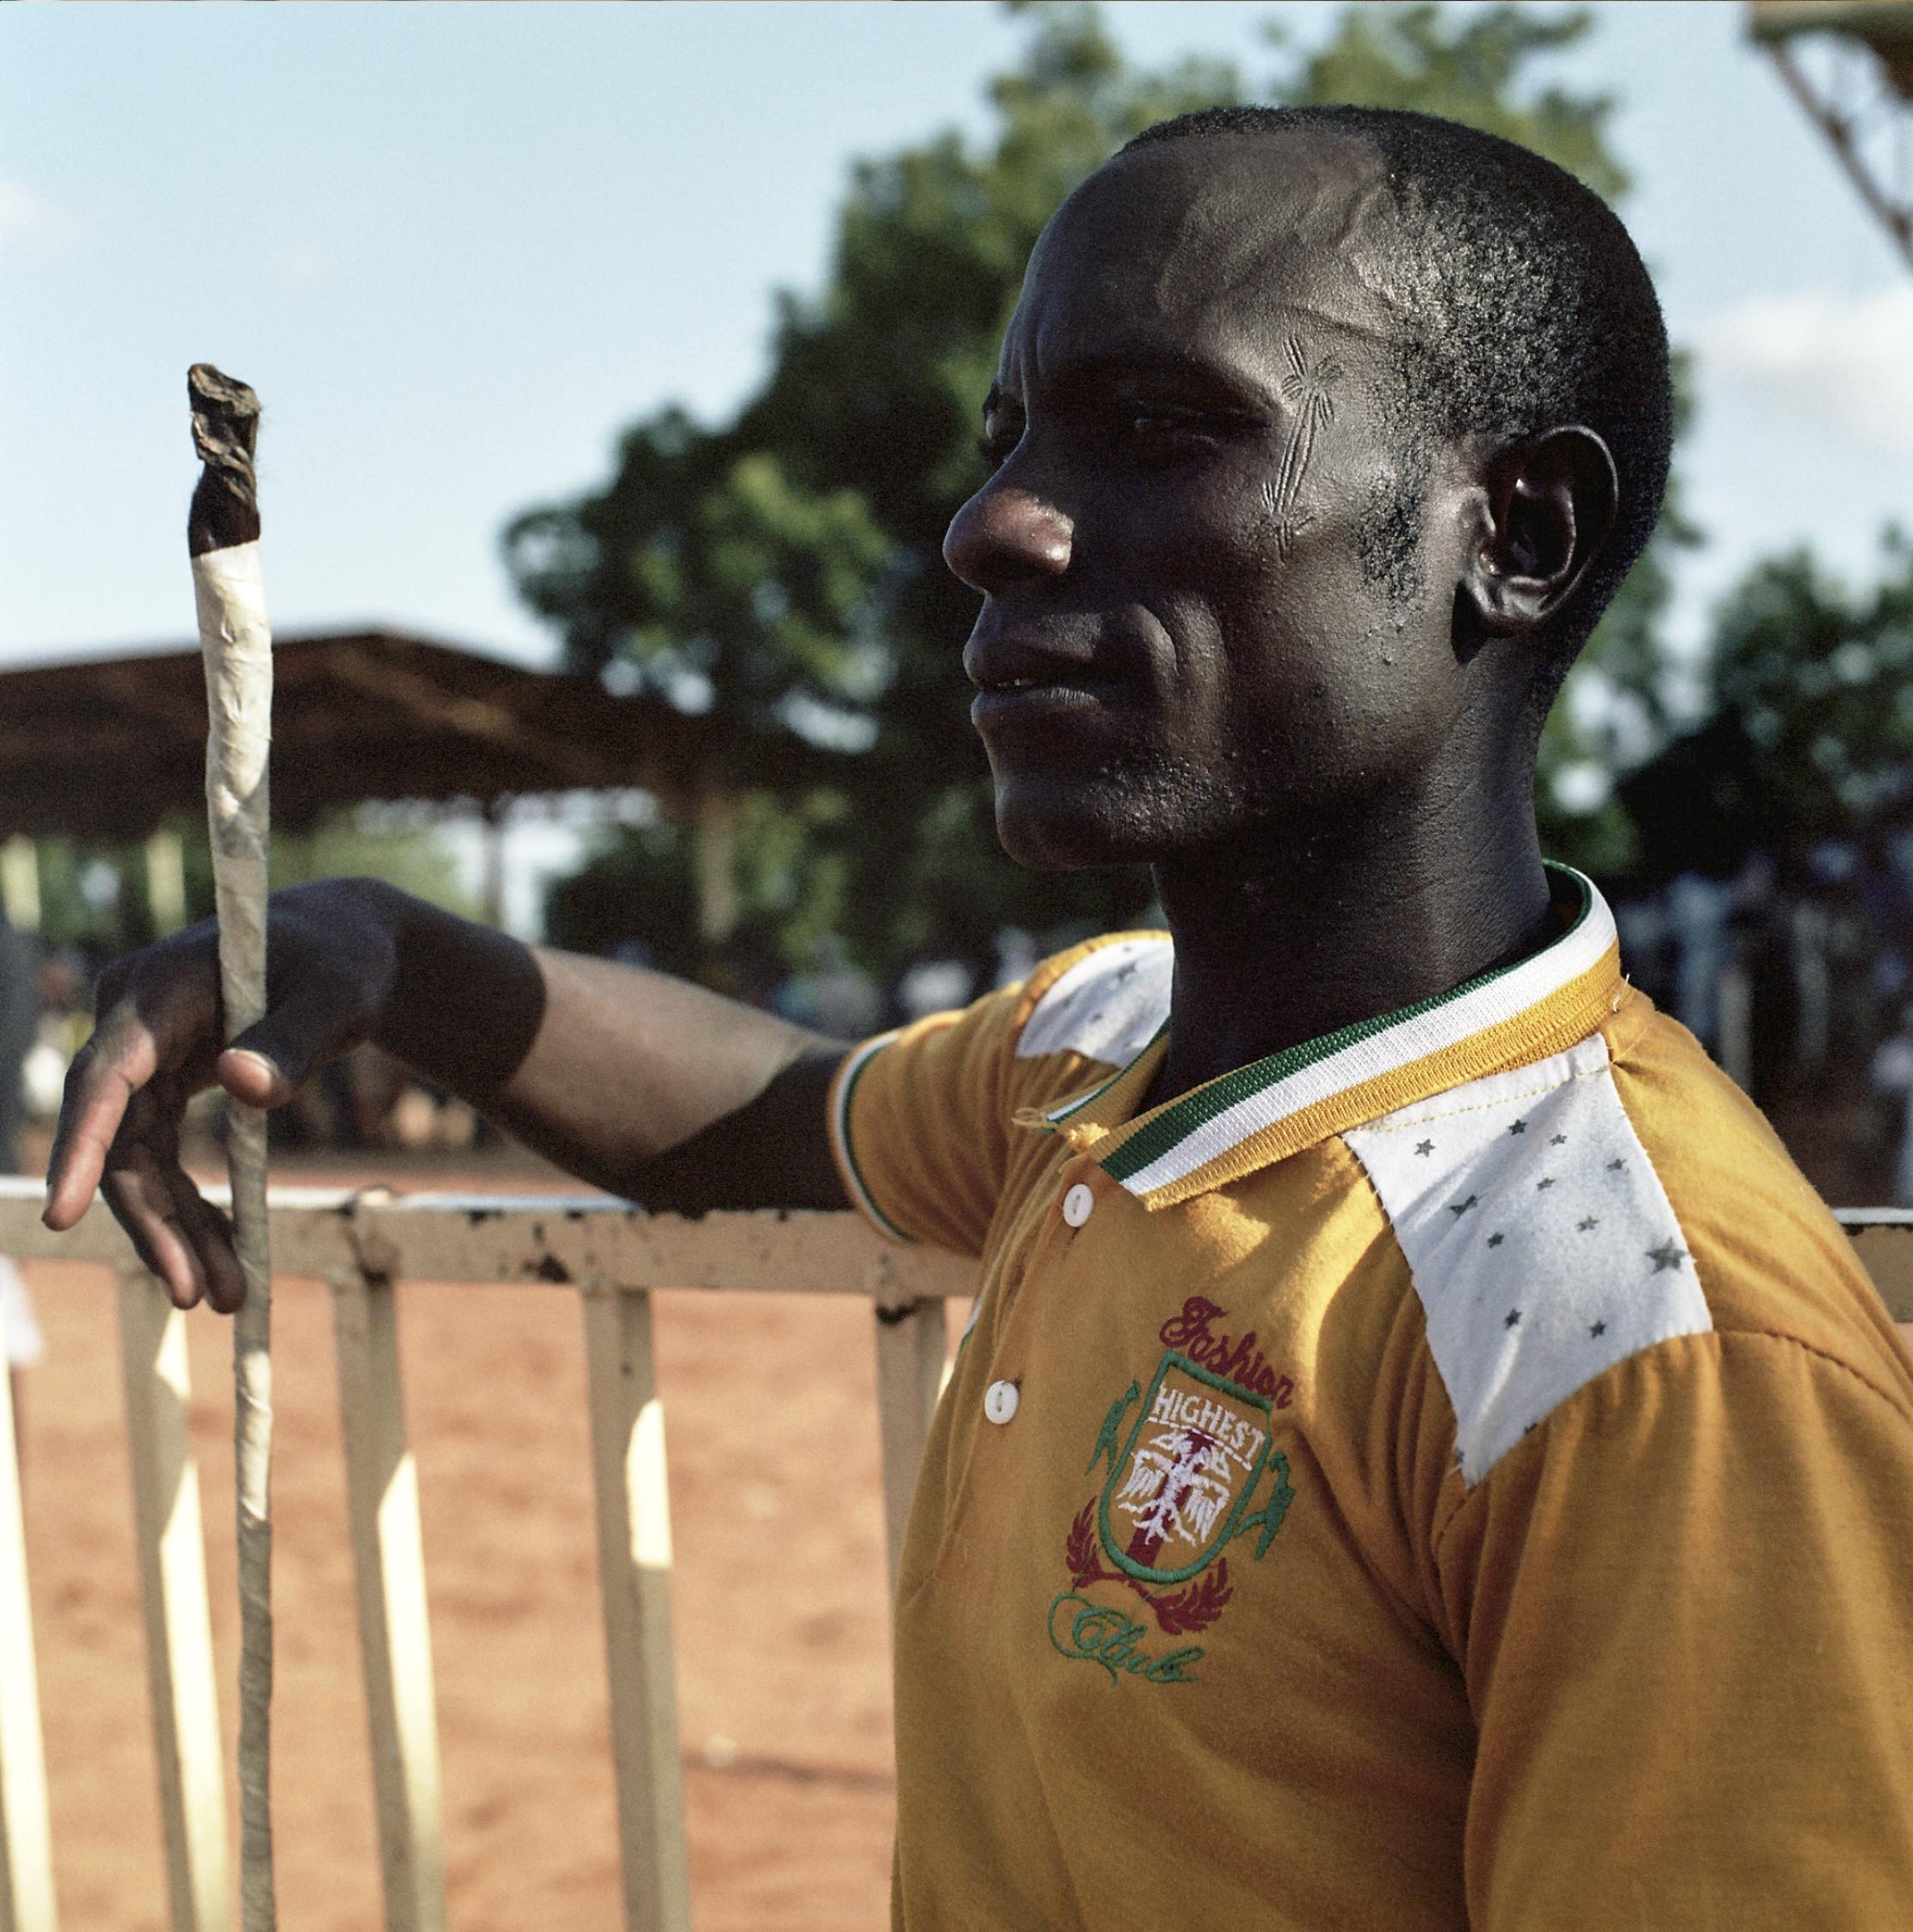 Tribal scars mark the face of a jockey.